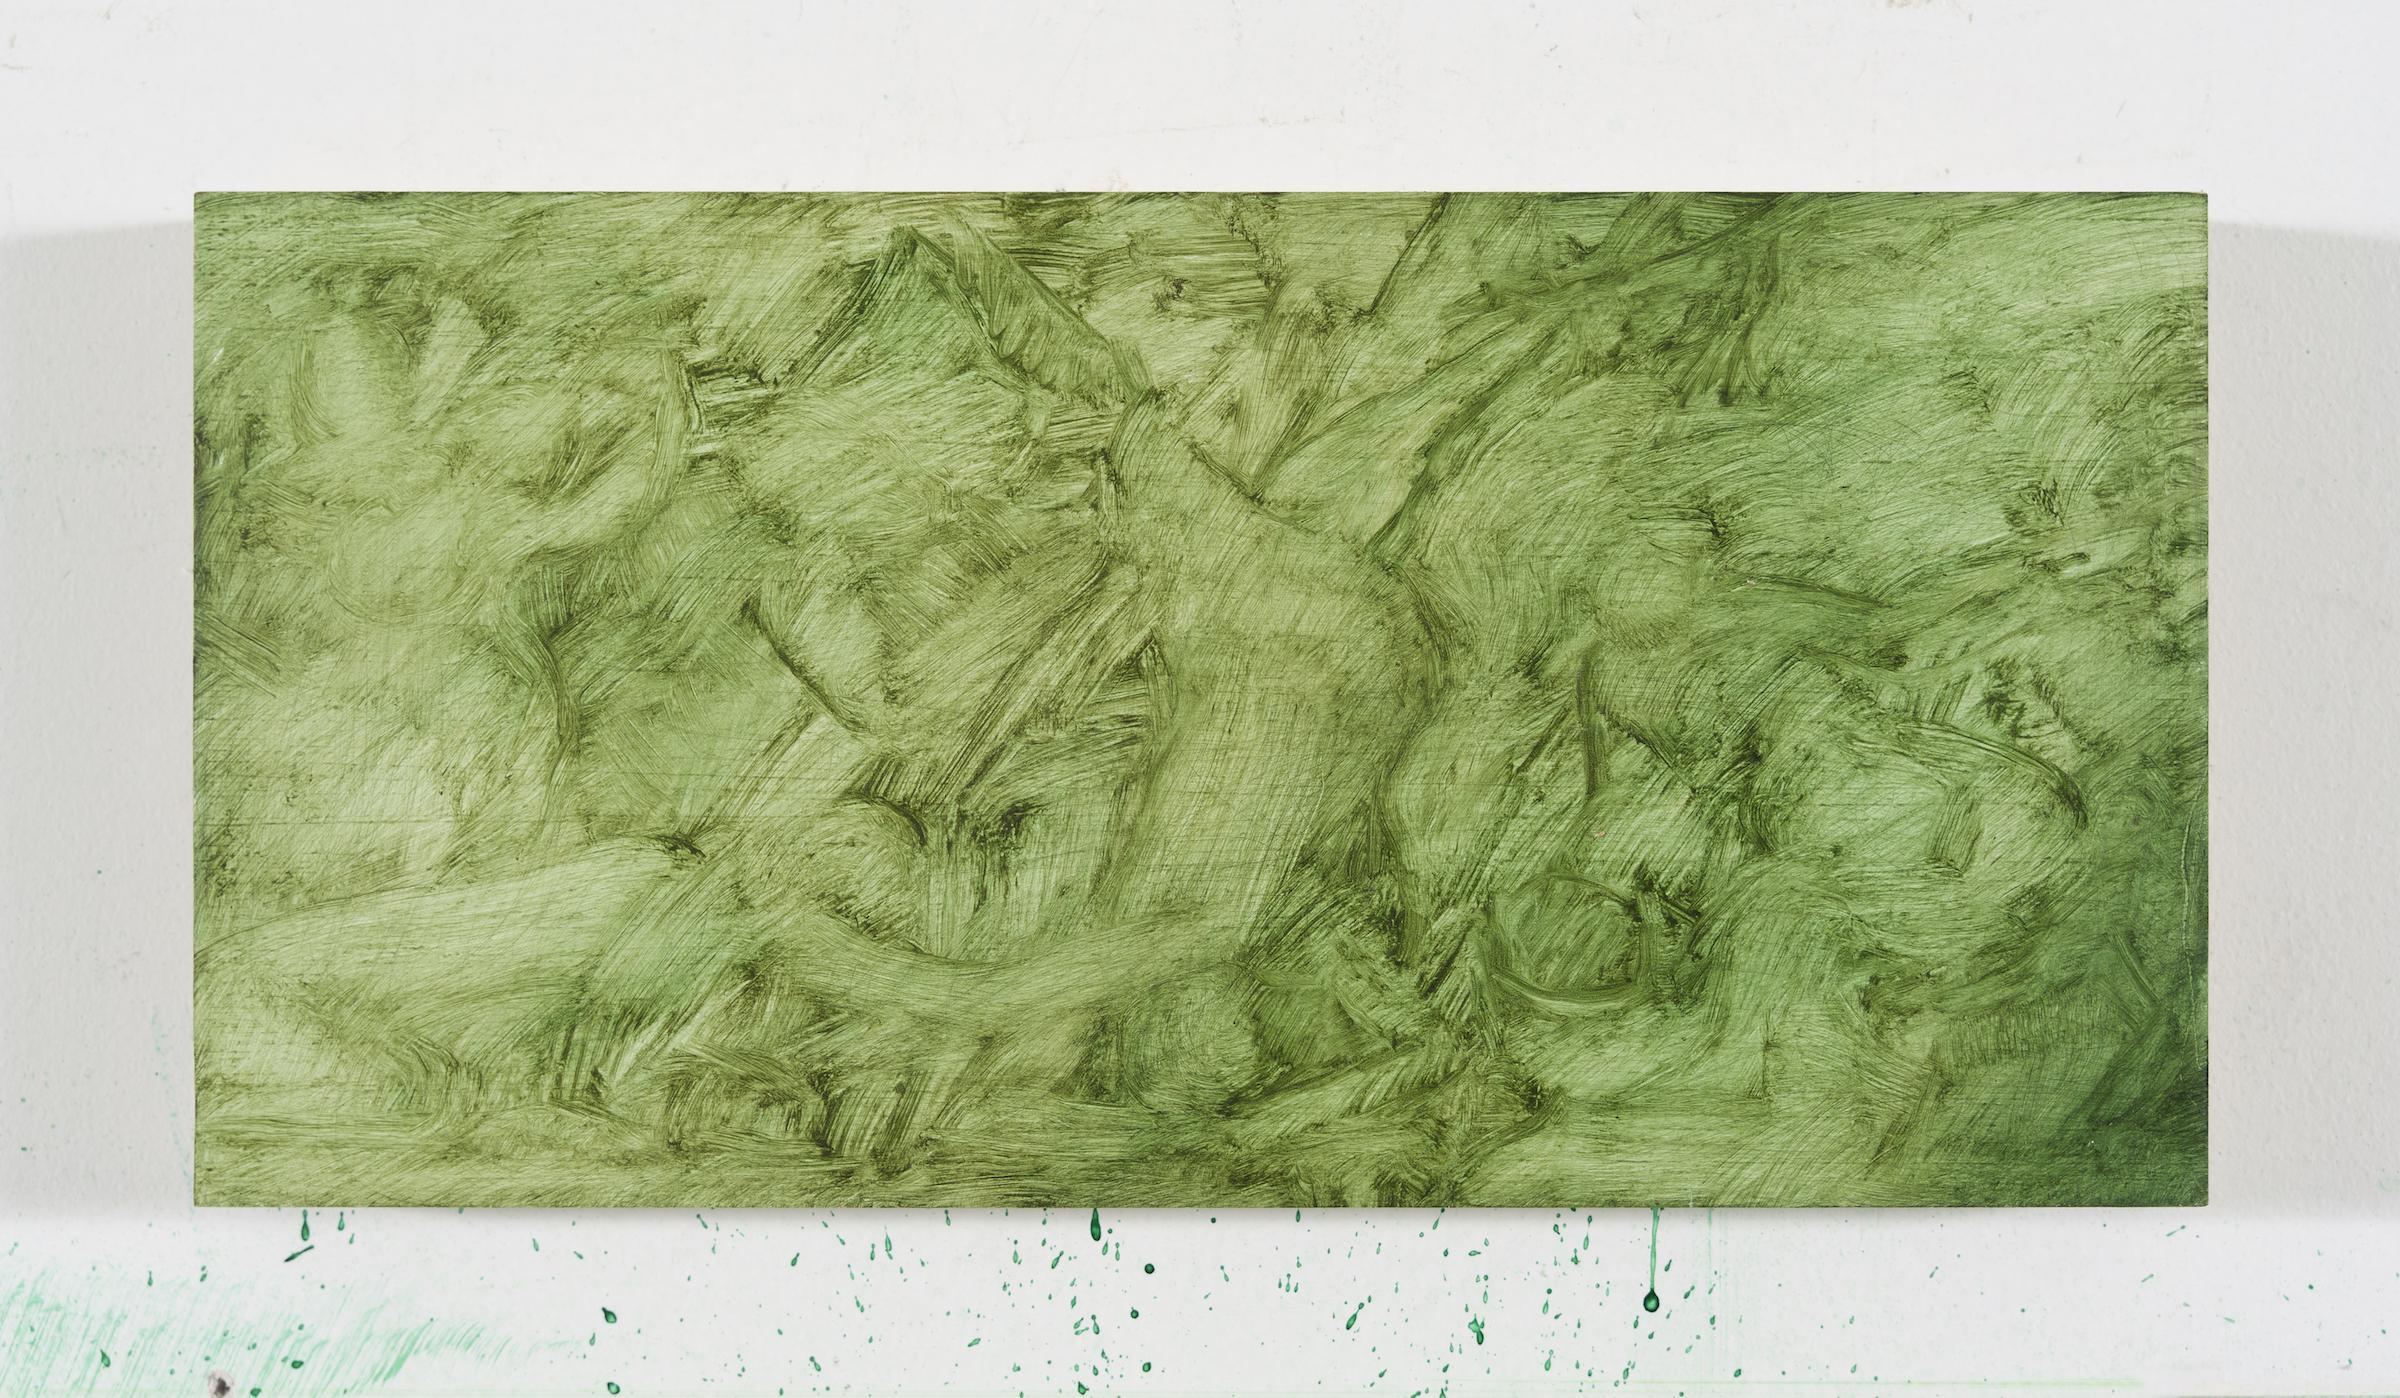 Brook Hsu 'Study of Titian ́s Flaying of Marsyas', 2021, oil on wood, 14 x 27.9 x 1.9 cm. Photo: Stephen Faught, Courtesy the artist; Kraupa - Tuskany Zeidler, Berlin